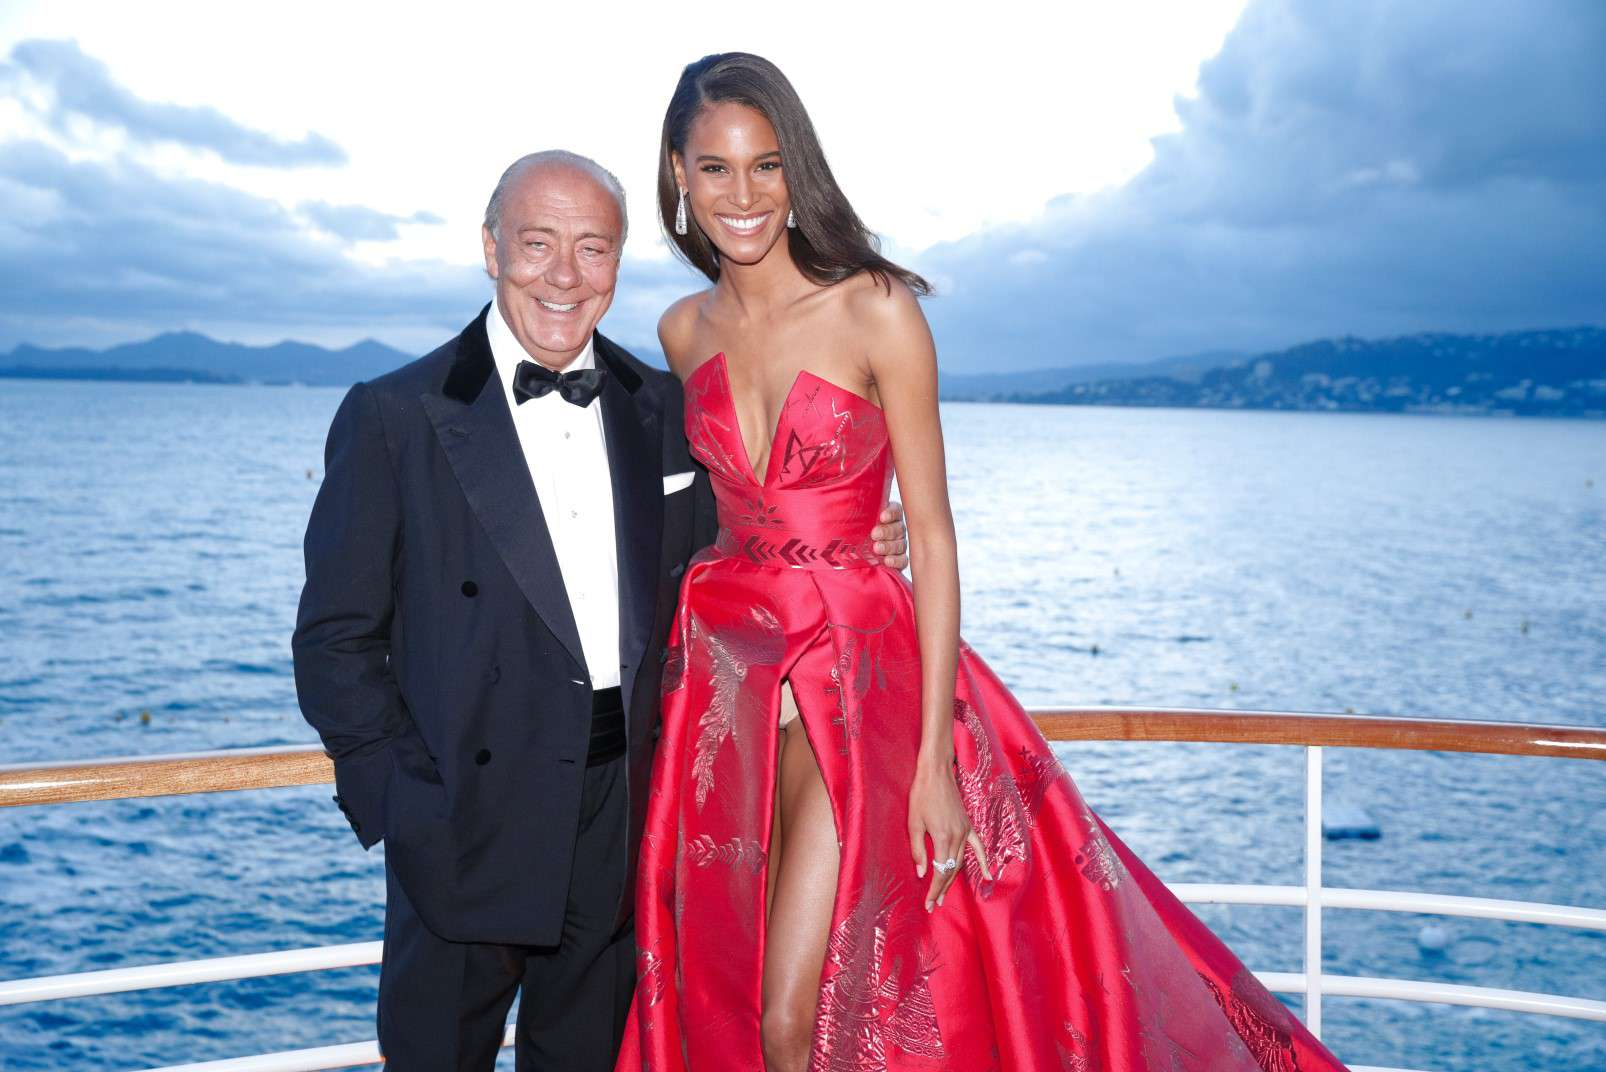 Cannes 2018, Cindy Bruna wearing de Grisogono jewellery, with de Grisogono CEO Fawaz Gruosi, photo courtesy of de Grisogono